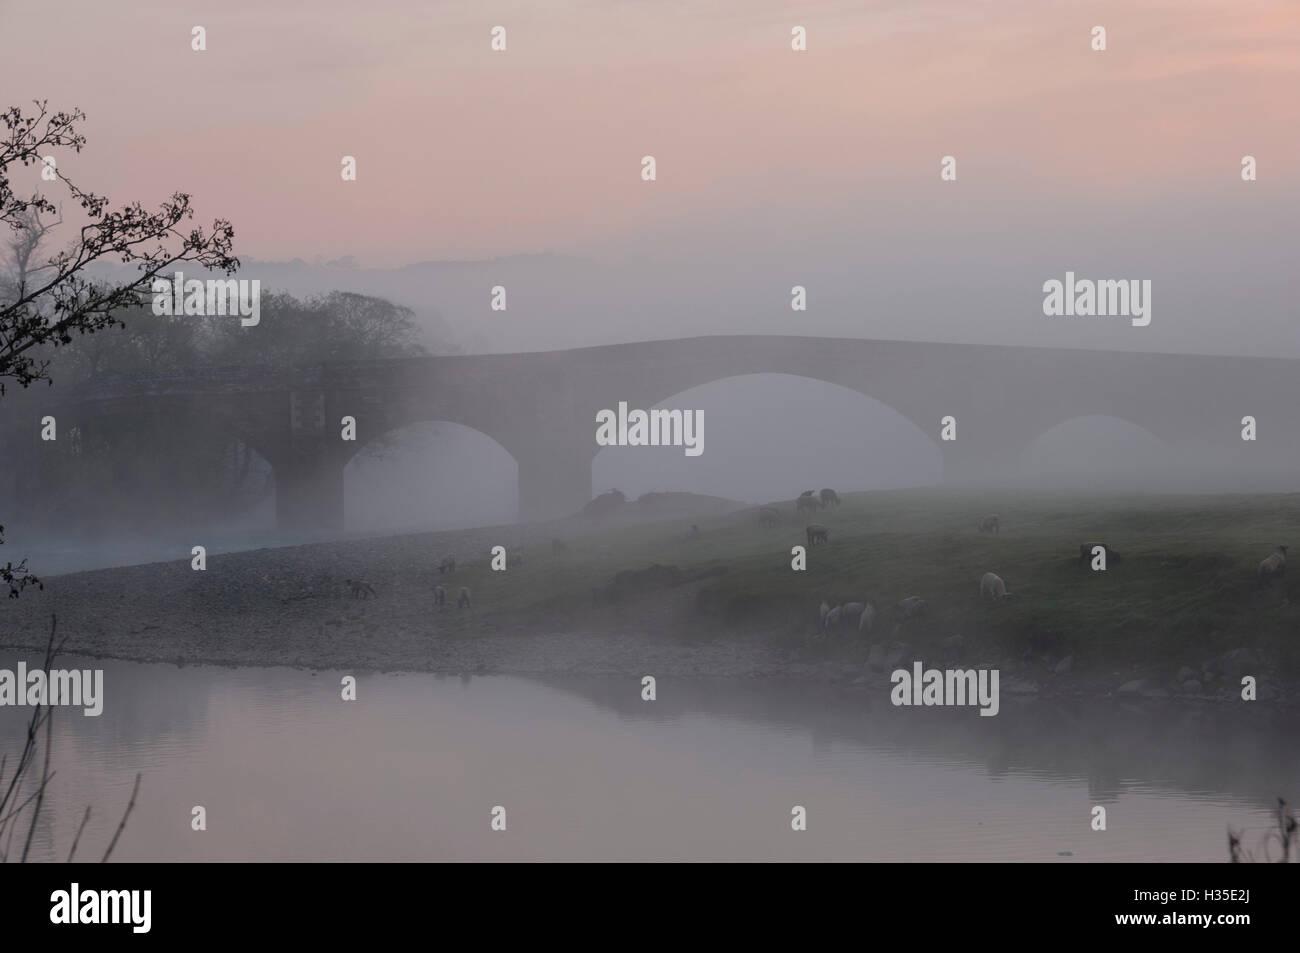 Eden Bridge, Lazonby, Eden Valley, Cumbria, England, UK - Stock Image